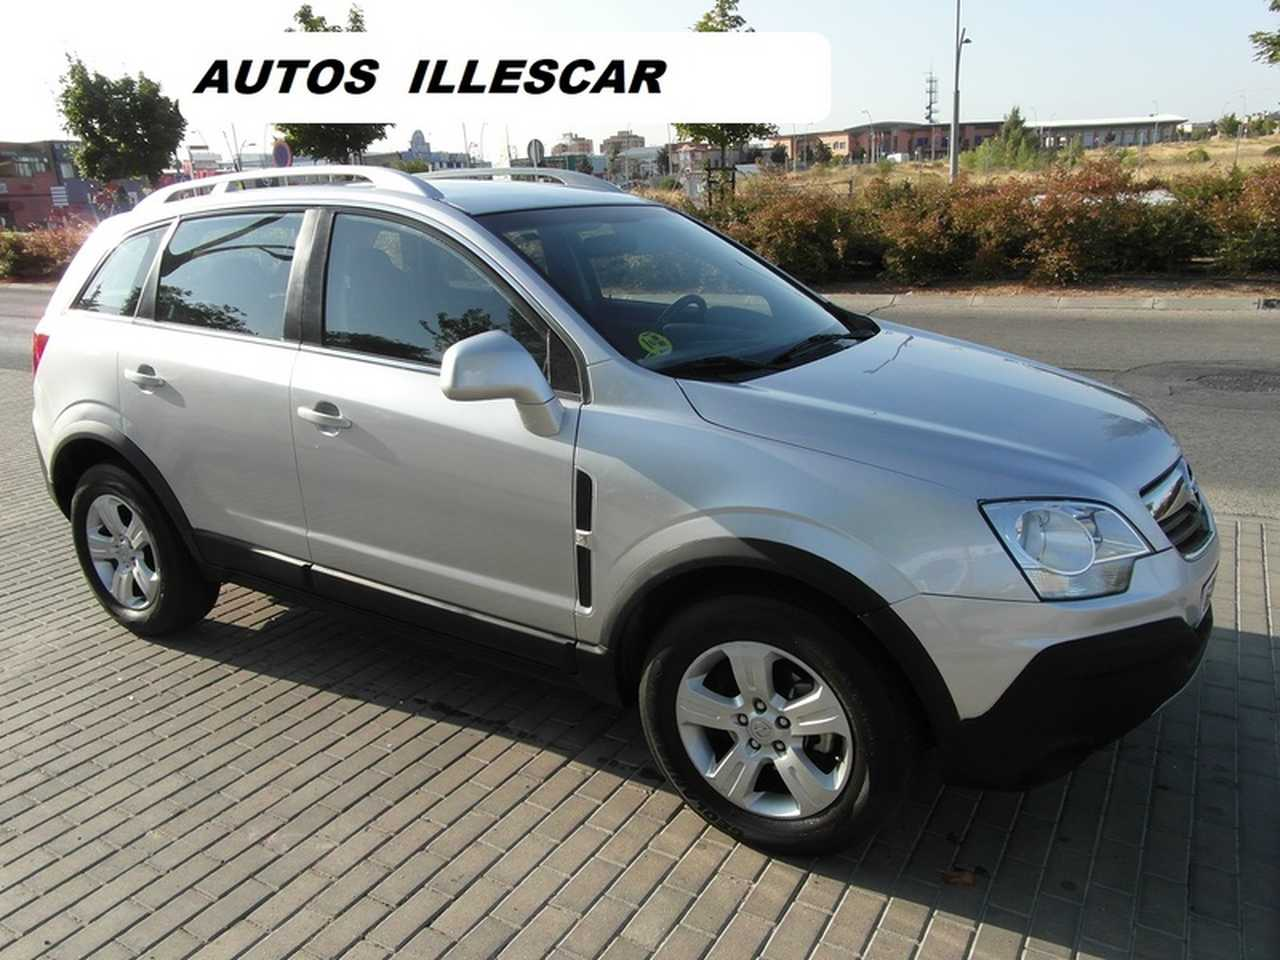 Opel Antara 2.0 CDTI  150 CV 118.907 KM   - Foto 1